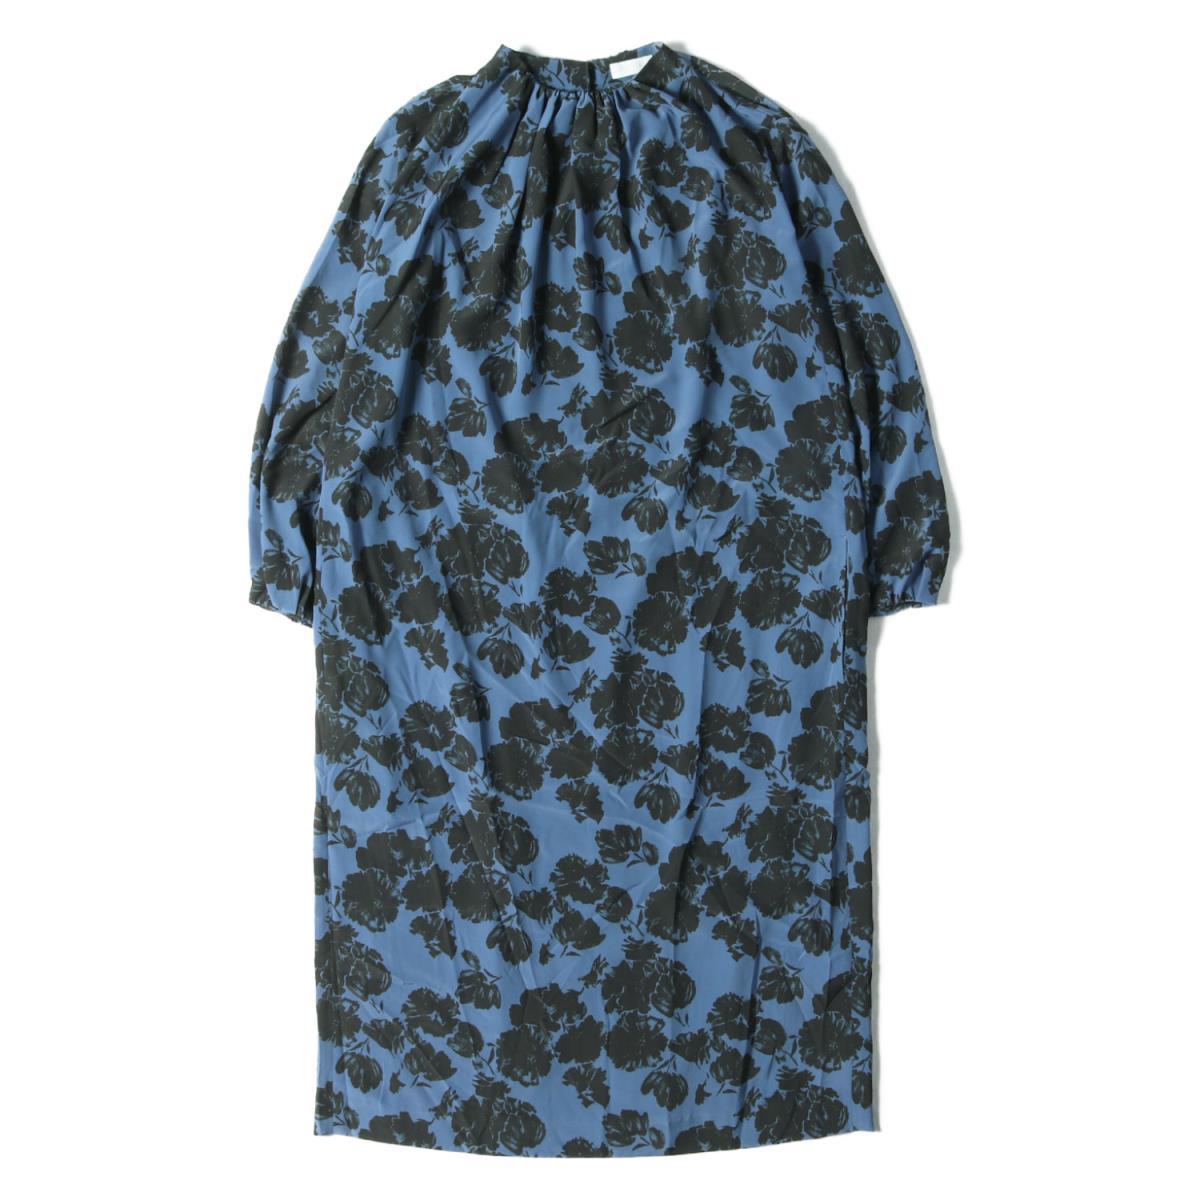 Ballsey ボールジィ ワンピース 花柄 ベルト付き ワンピース 20春夏 ブルー×ブラック 36(9号) 【レディース】【K2592】